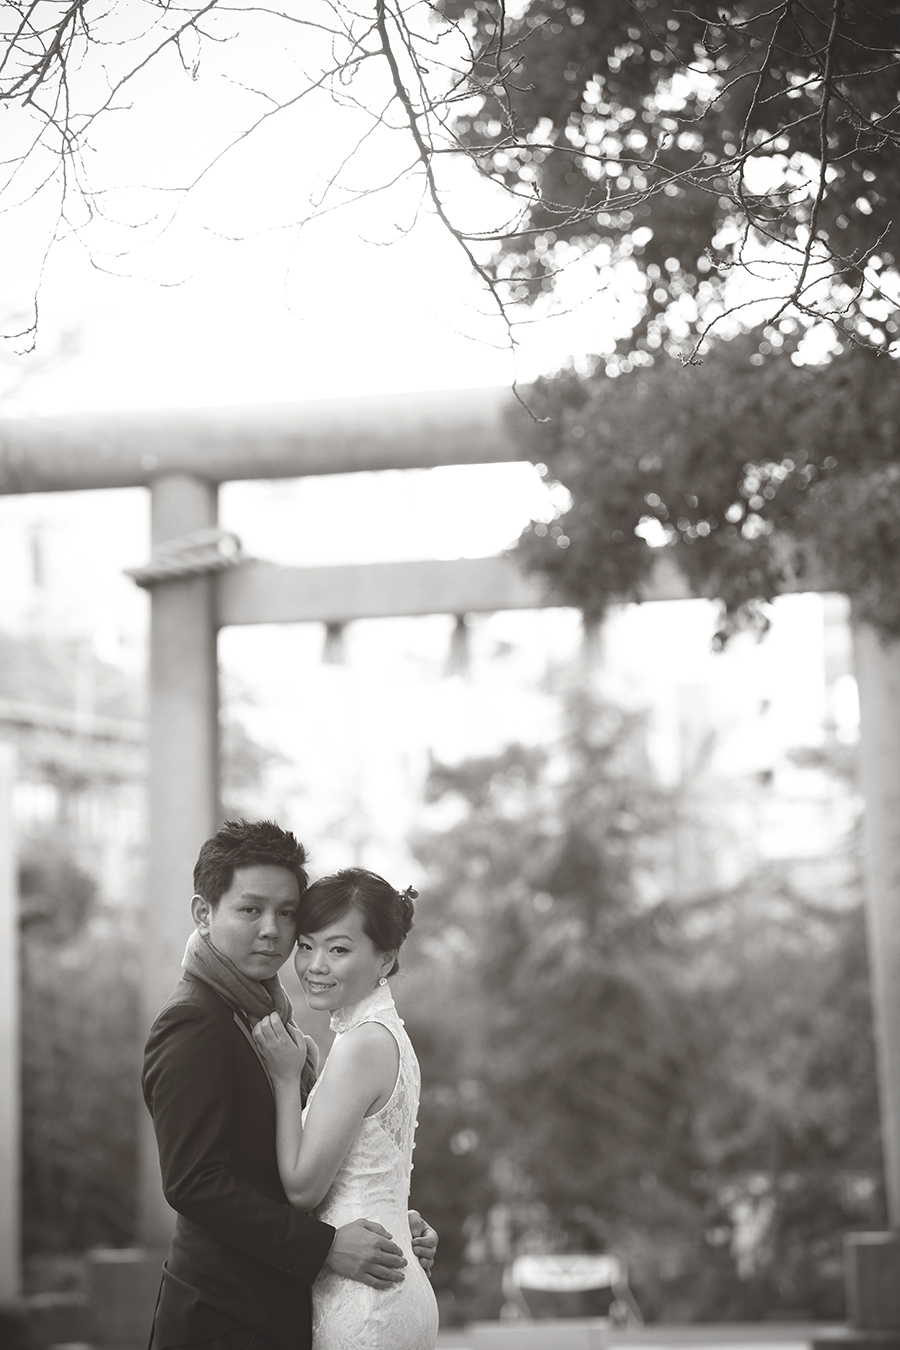 hokkaido tokyo japan . wedding photography by kurt ahs . 5079.jpg